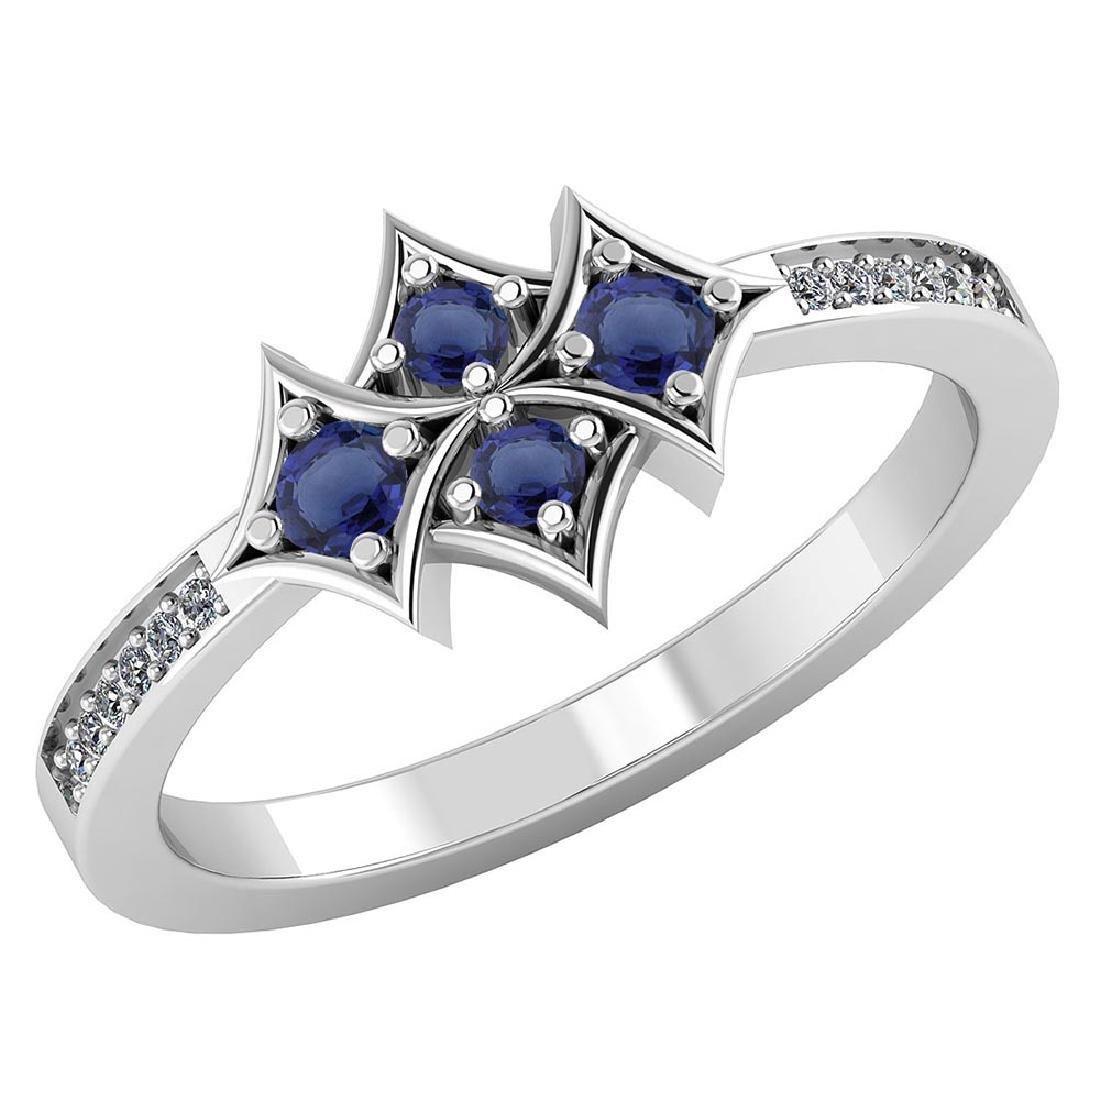 Certified 1.00 CTW Genuine Blue Sapphire And Diamond 14